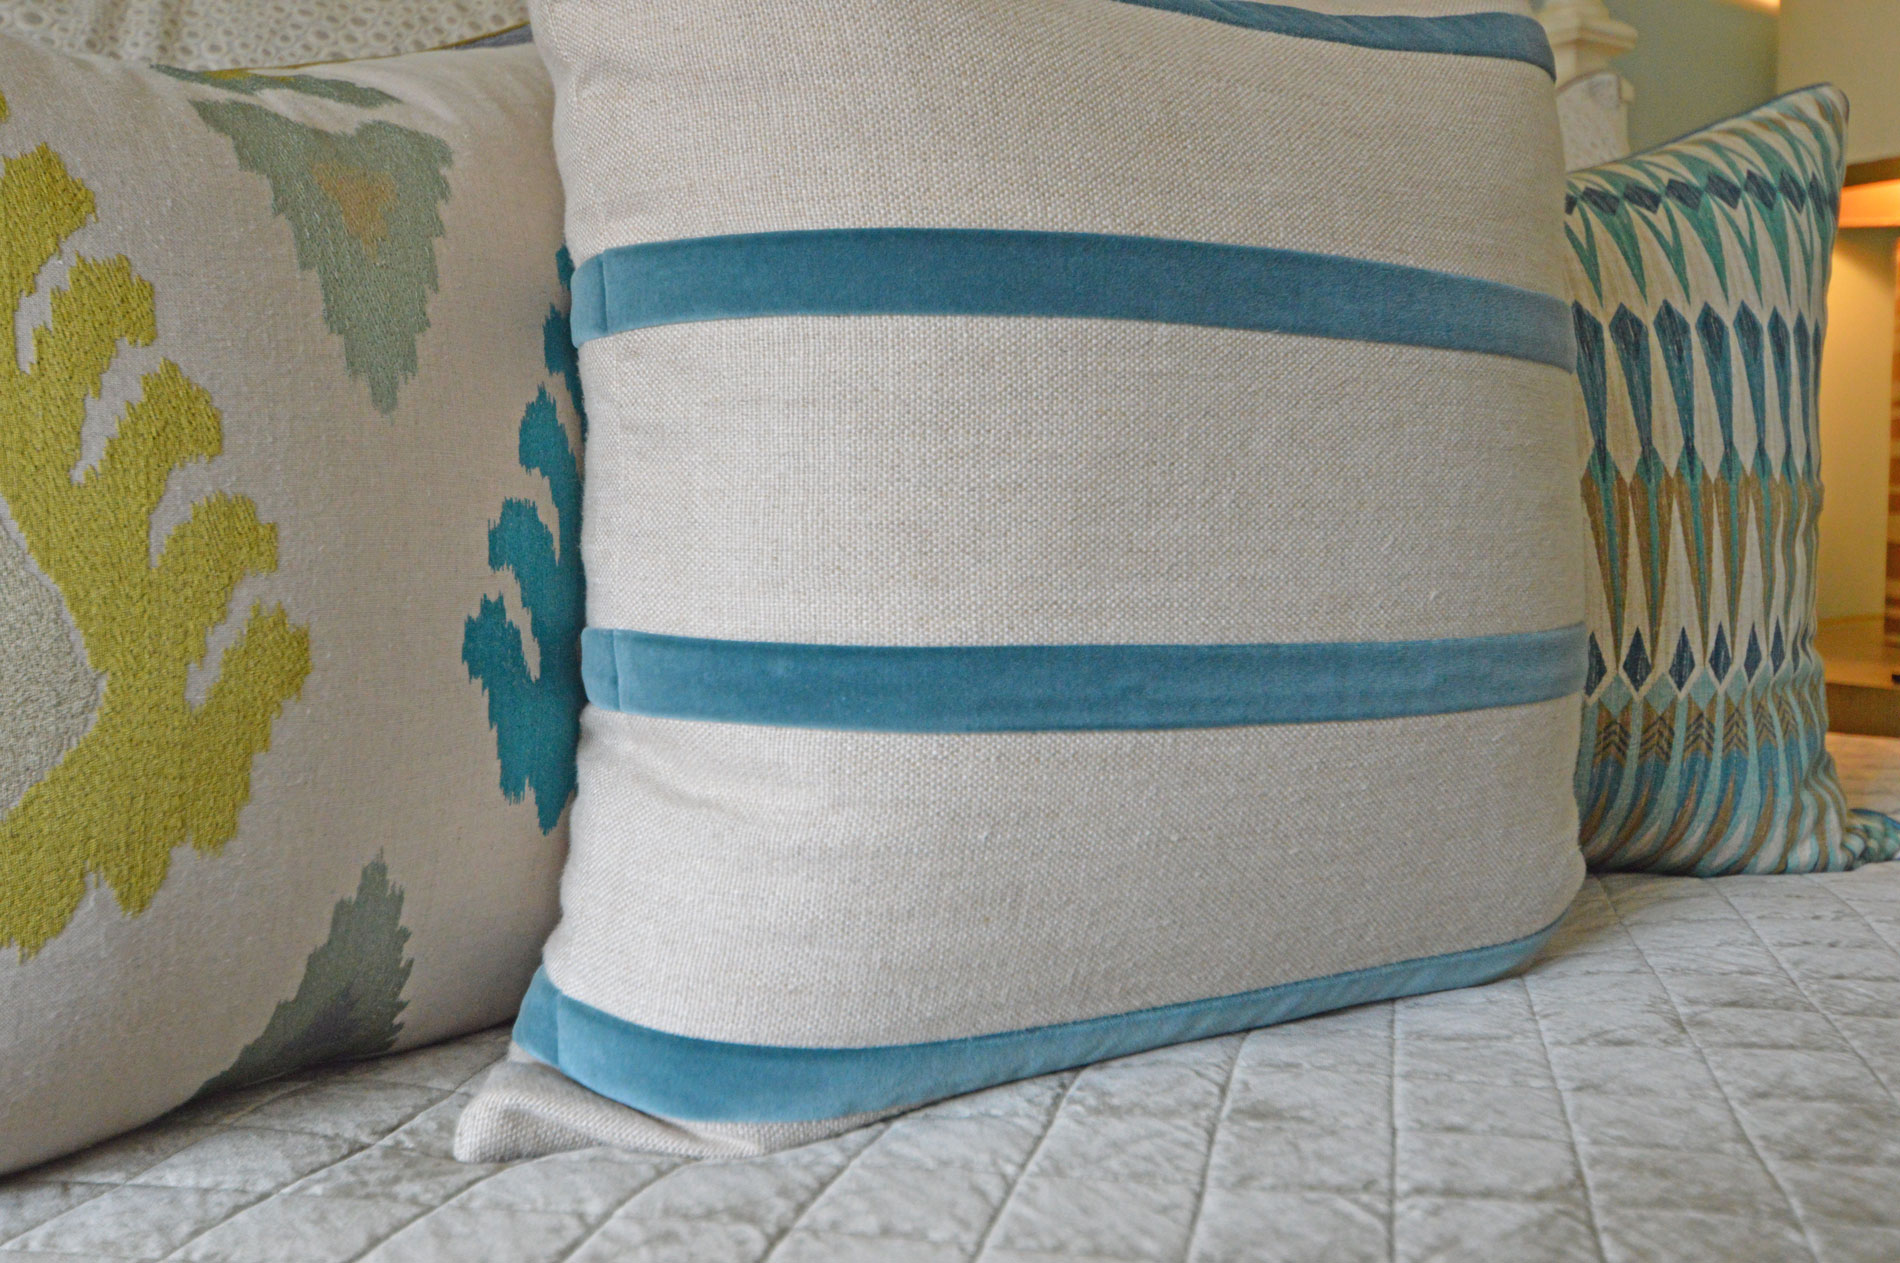 fawley-david2-dixon-smith-interiors-baton-rouge-interior-design-custom-furniture-web-0010